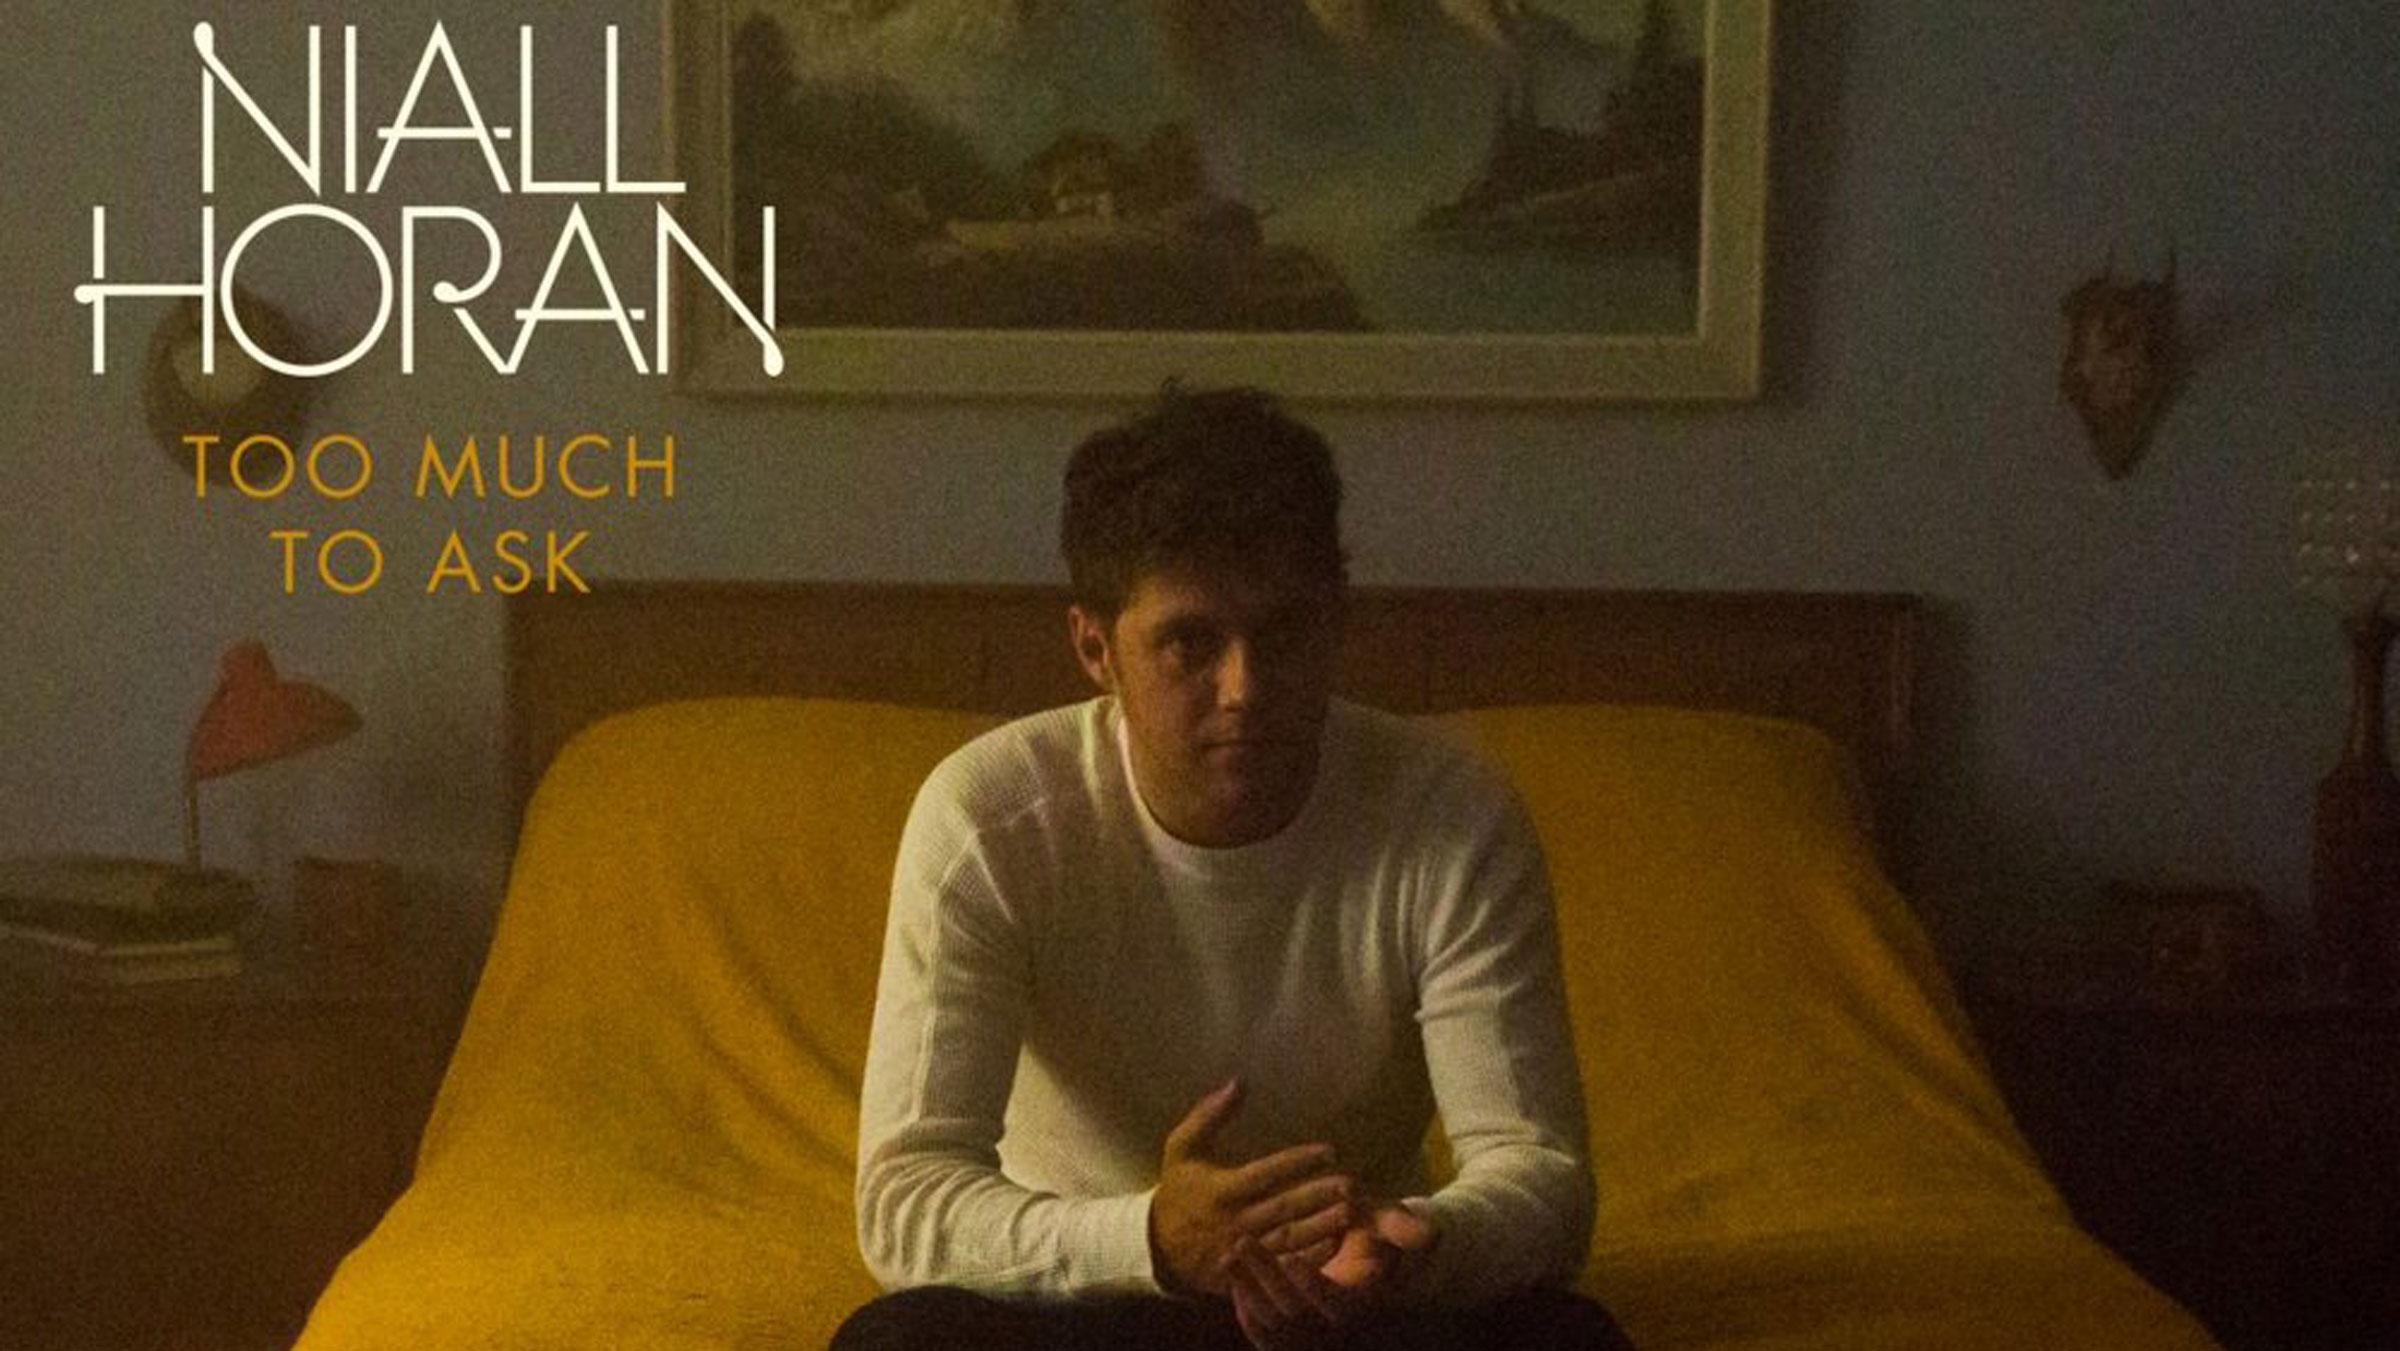 Niall home